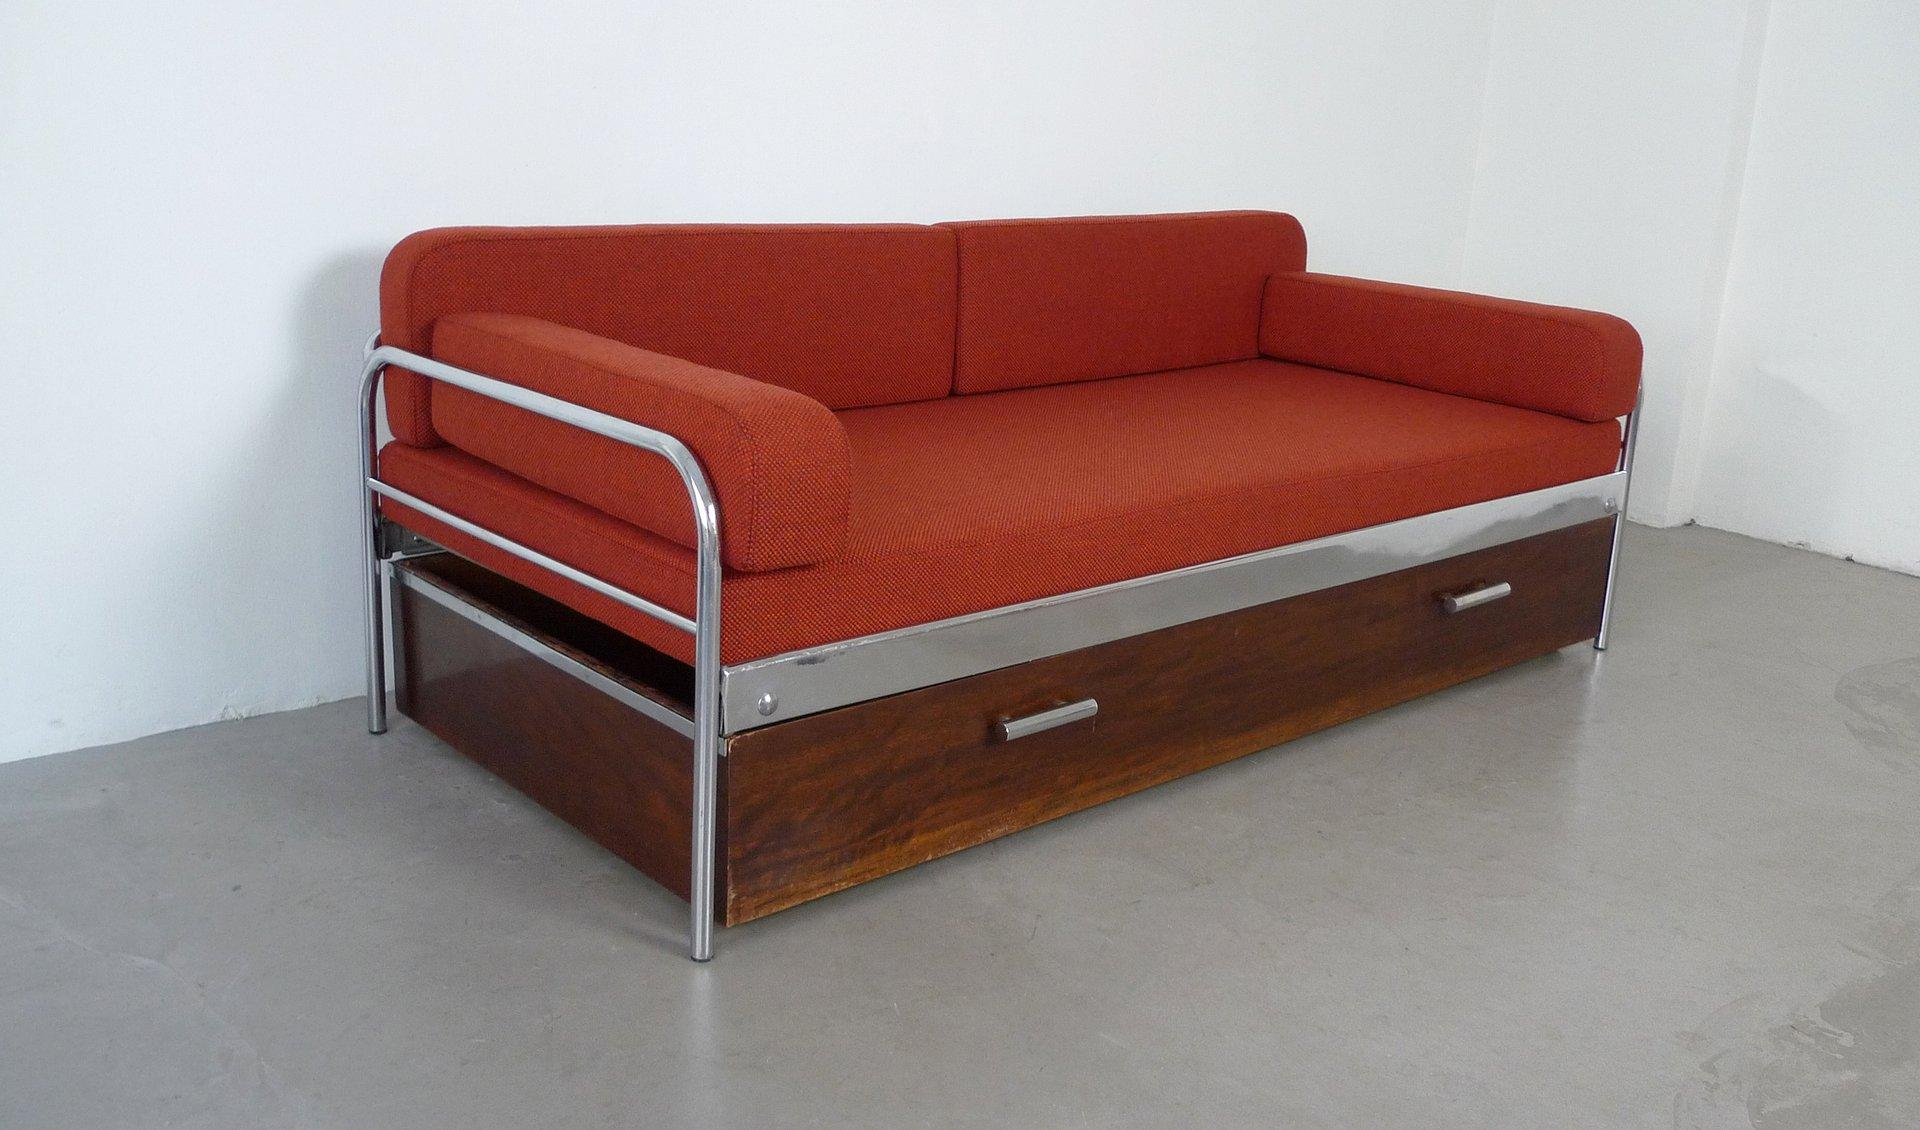 Czechoslovak Bauhaus Steel Tube Sofa Bed From Mcke